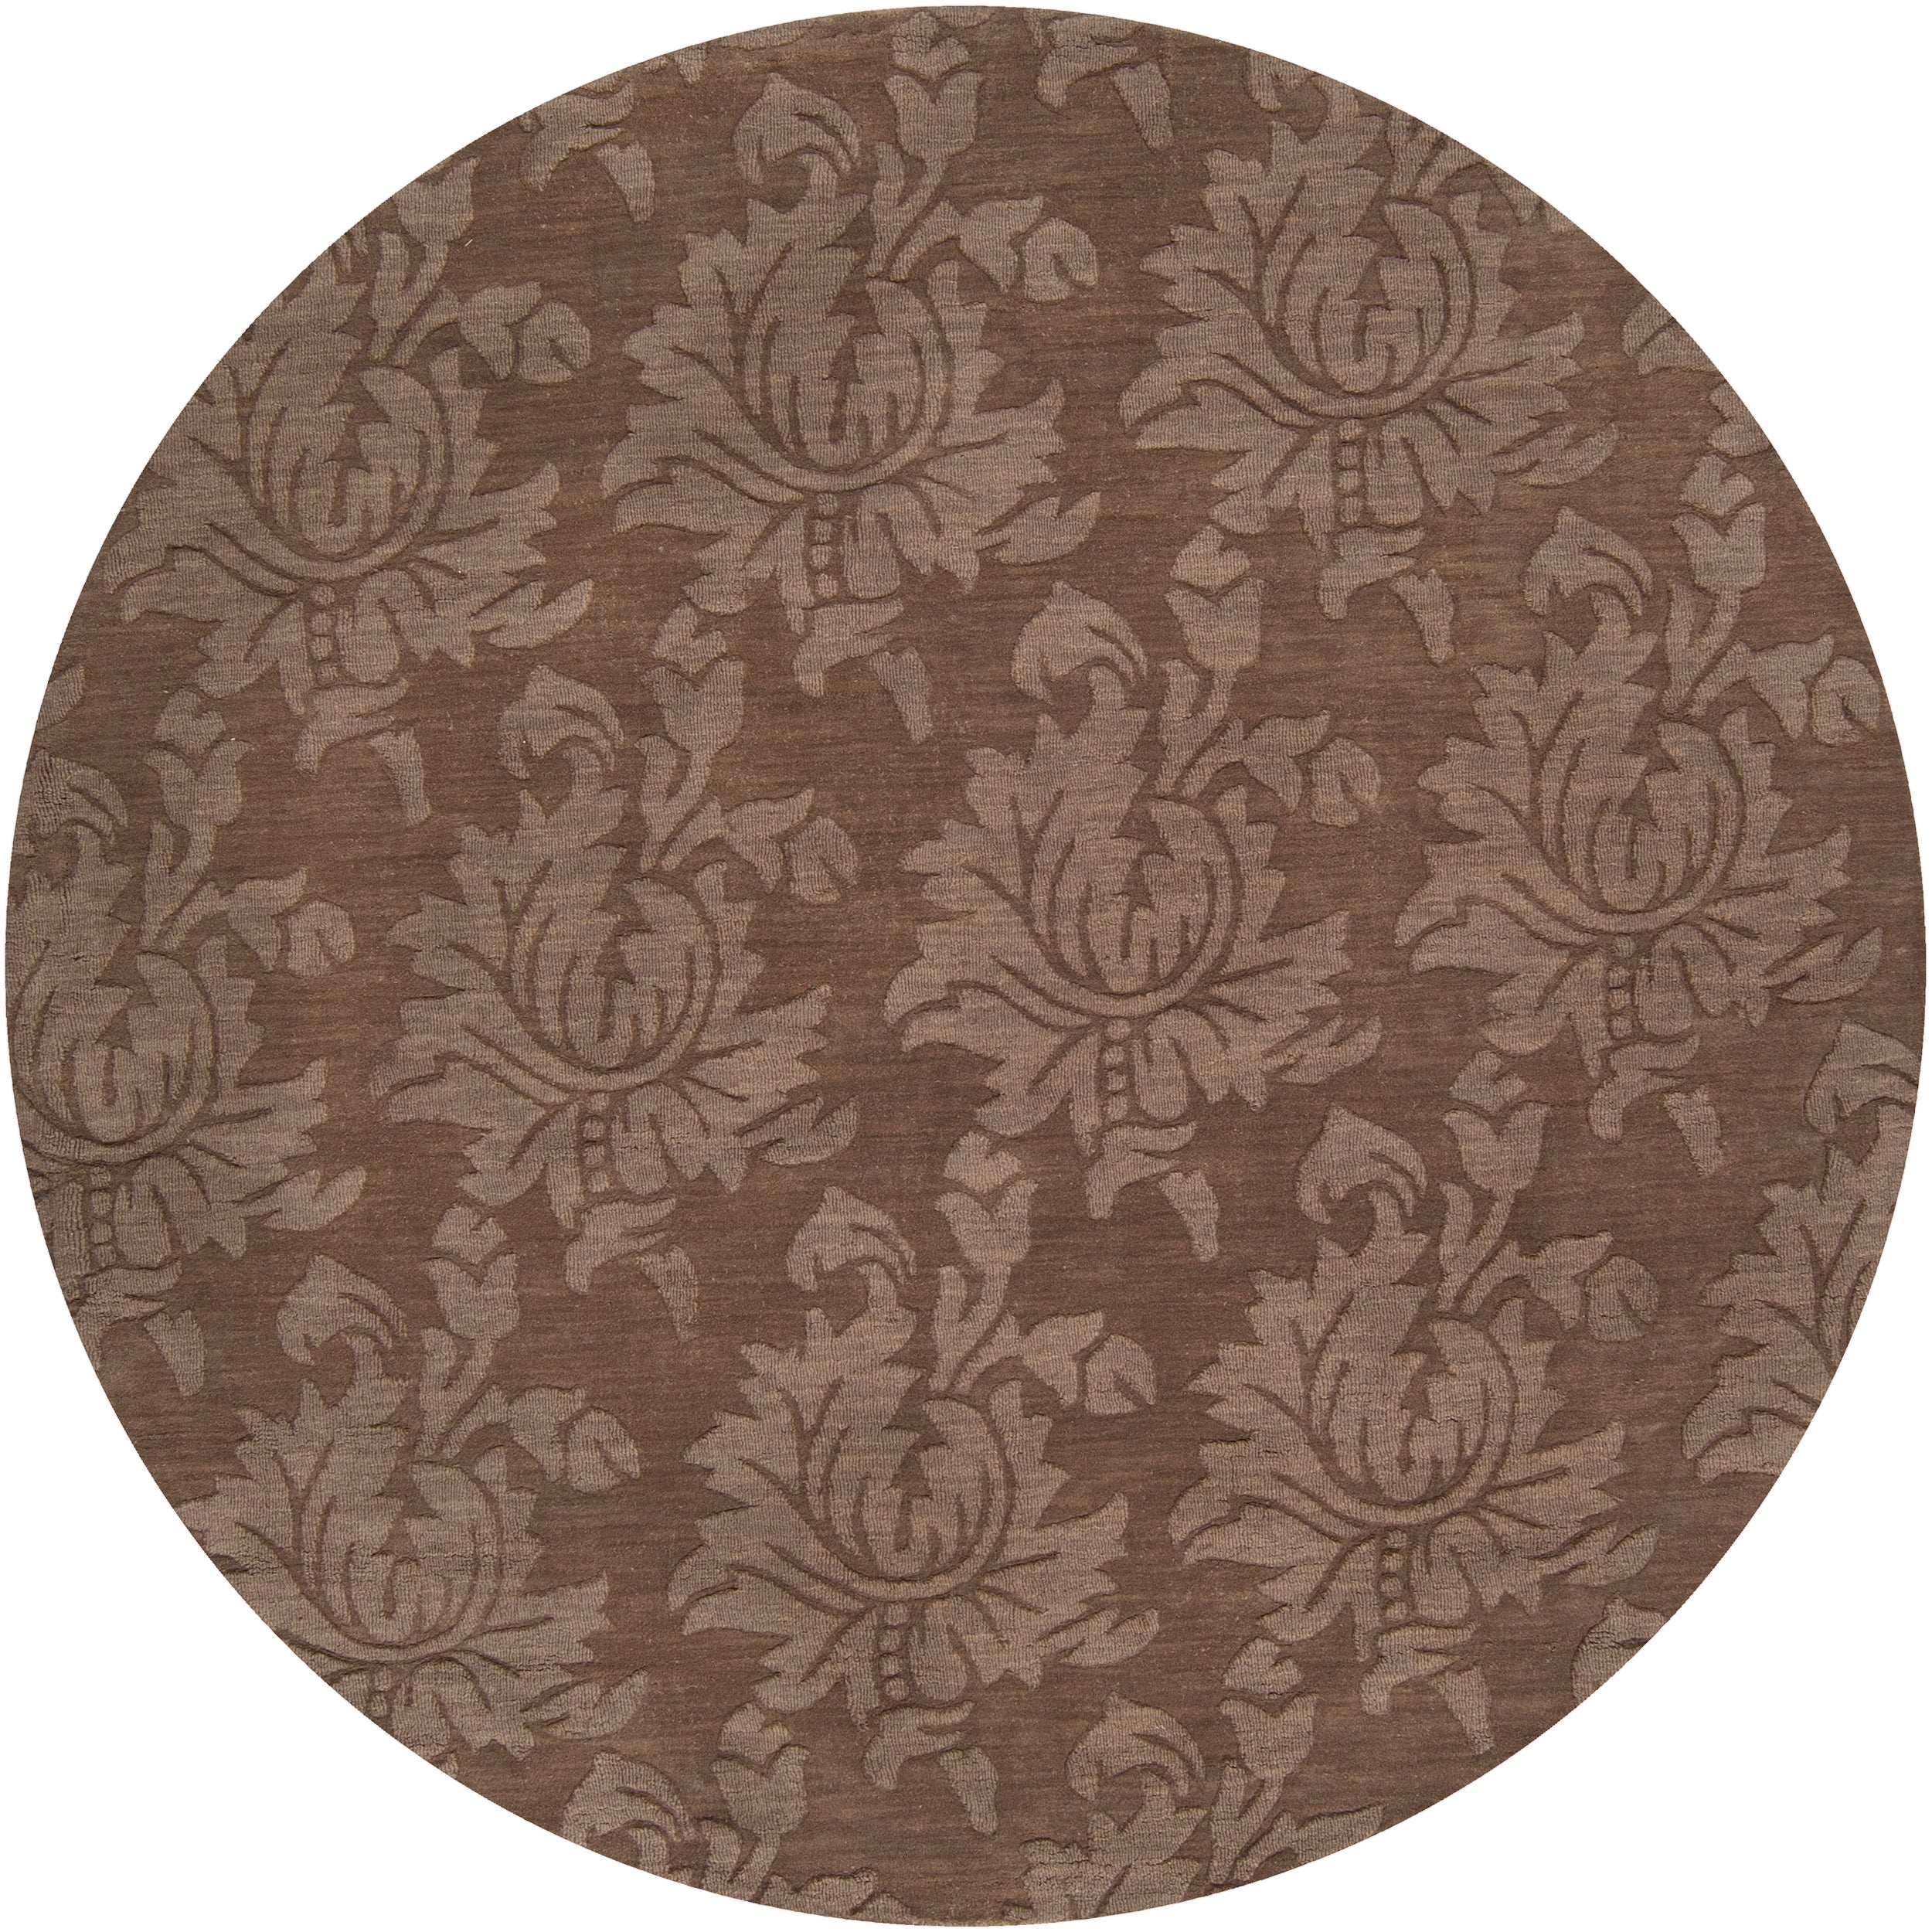 Hand Tufted Sophia Brown Wool Area Rug (8' x 8')